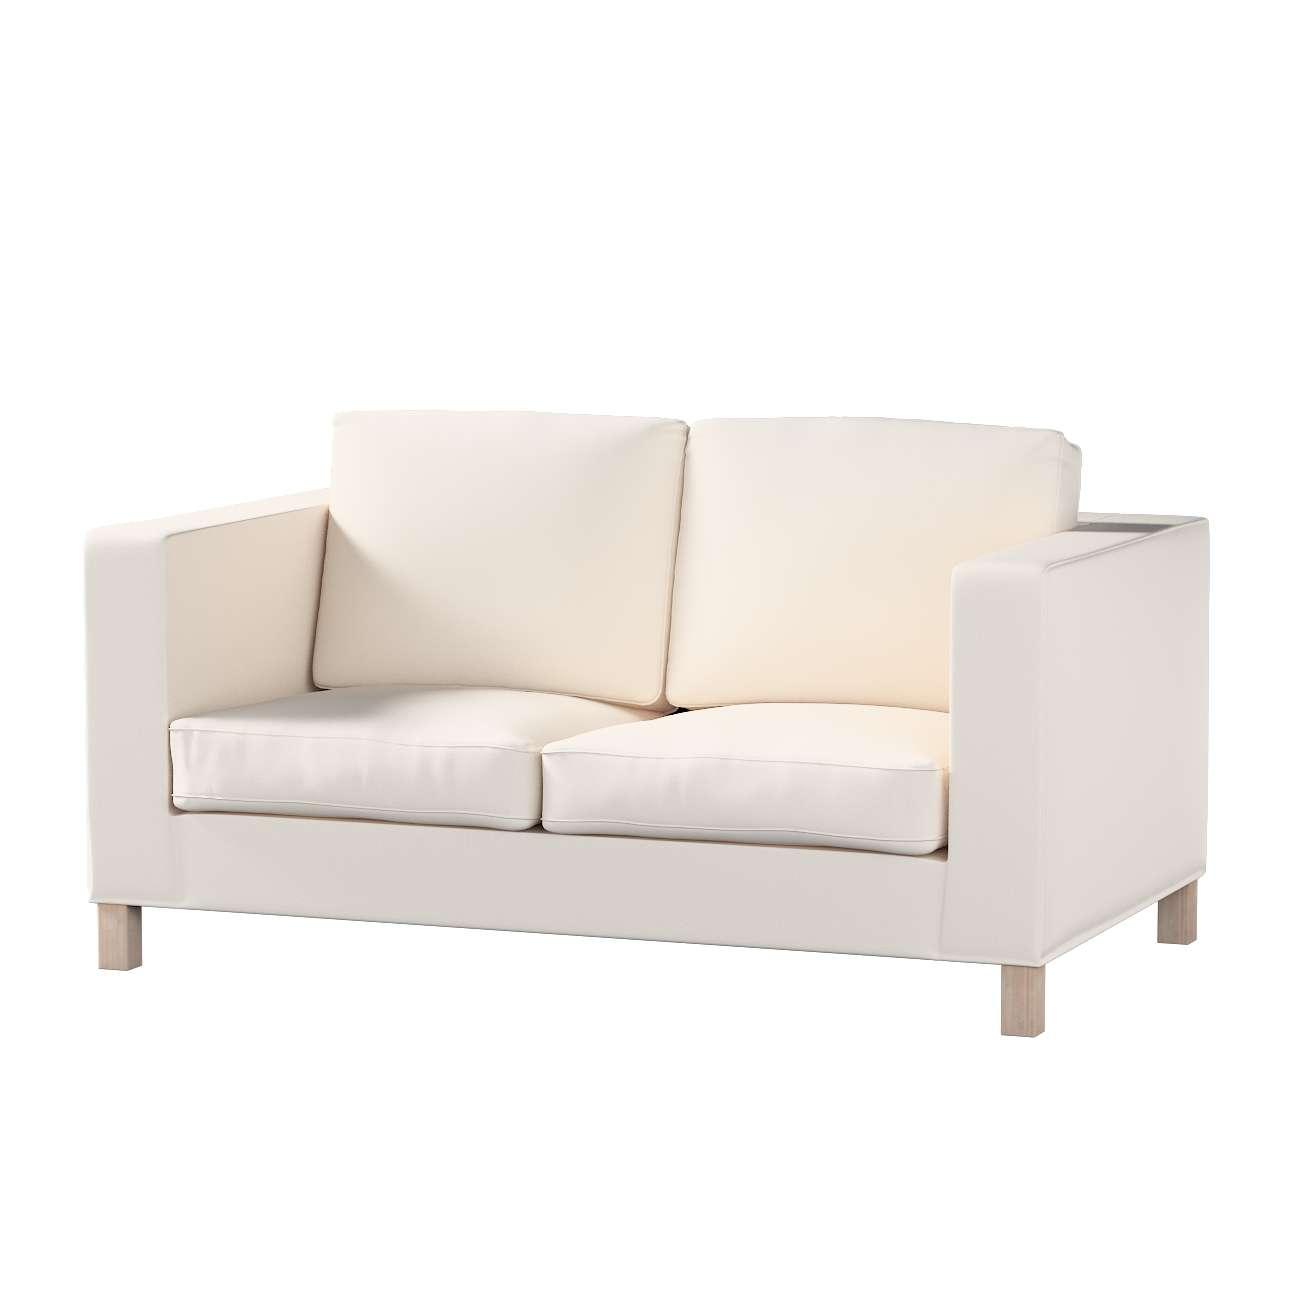 karlanda bezug f r das sofa den sessel den hocker im. Black Bedroom Furniture Sets. Home Design Ideas